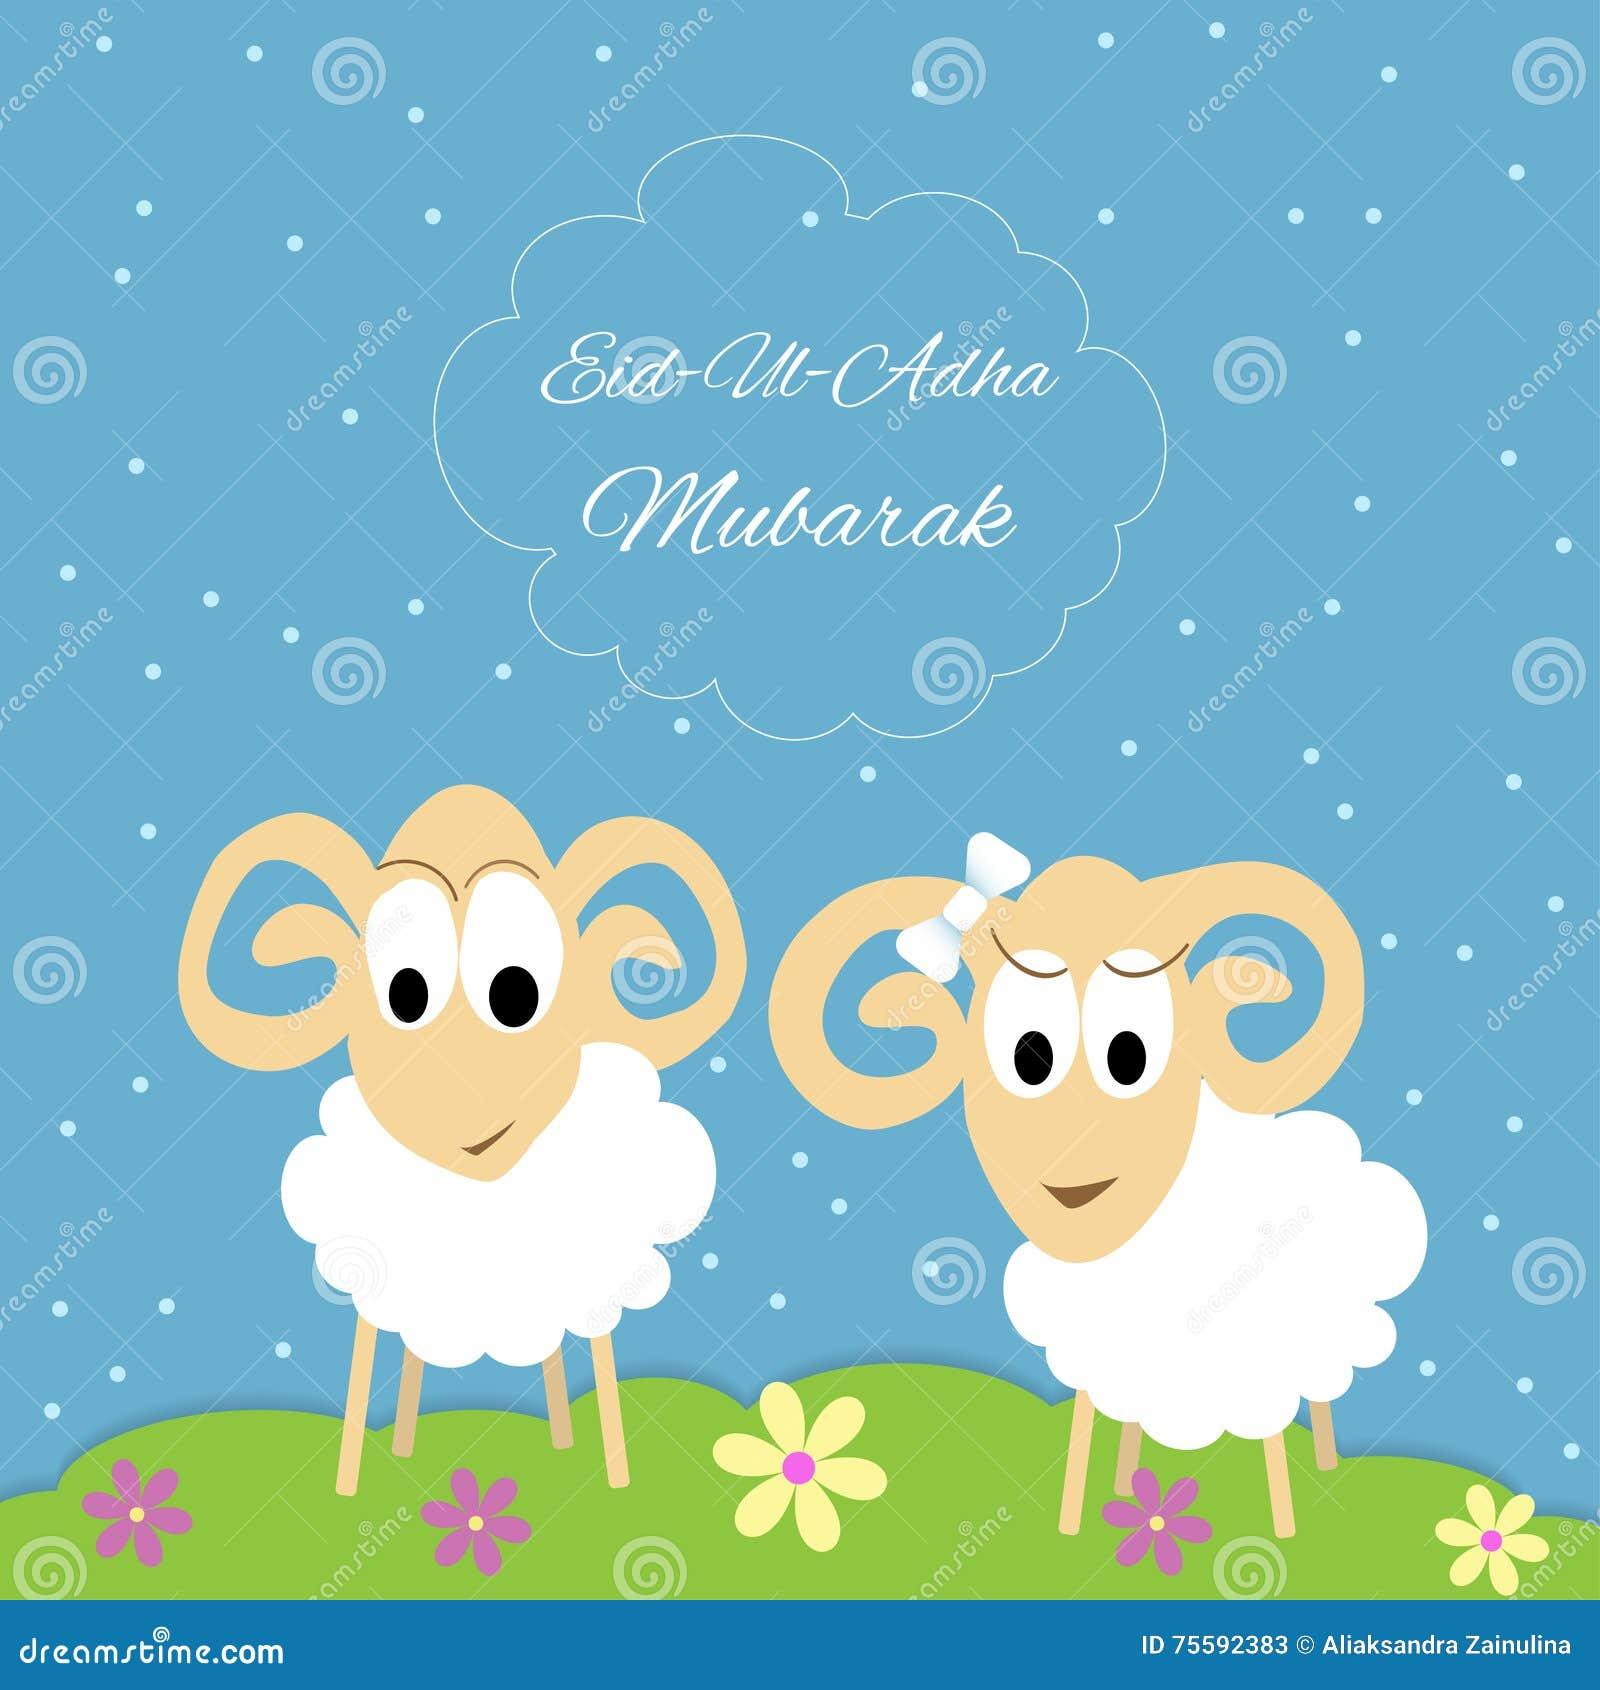 Eid Al Adha Greeting Card Stock Vector Illustration Of Funny 75592383